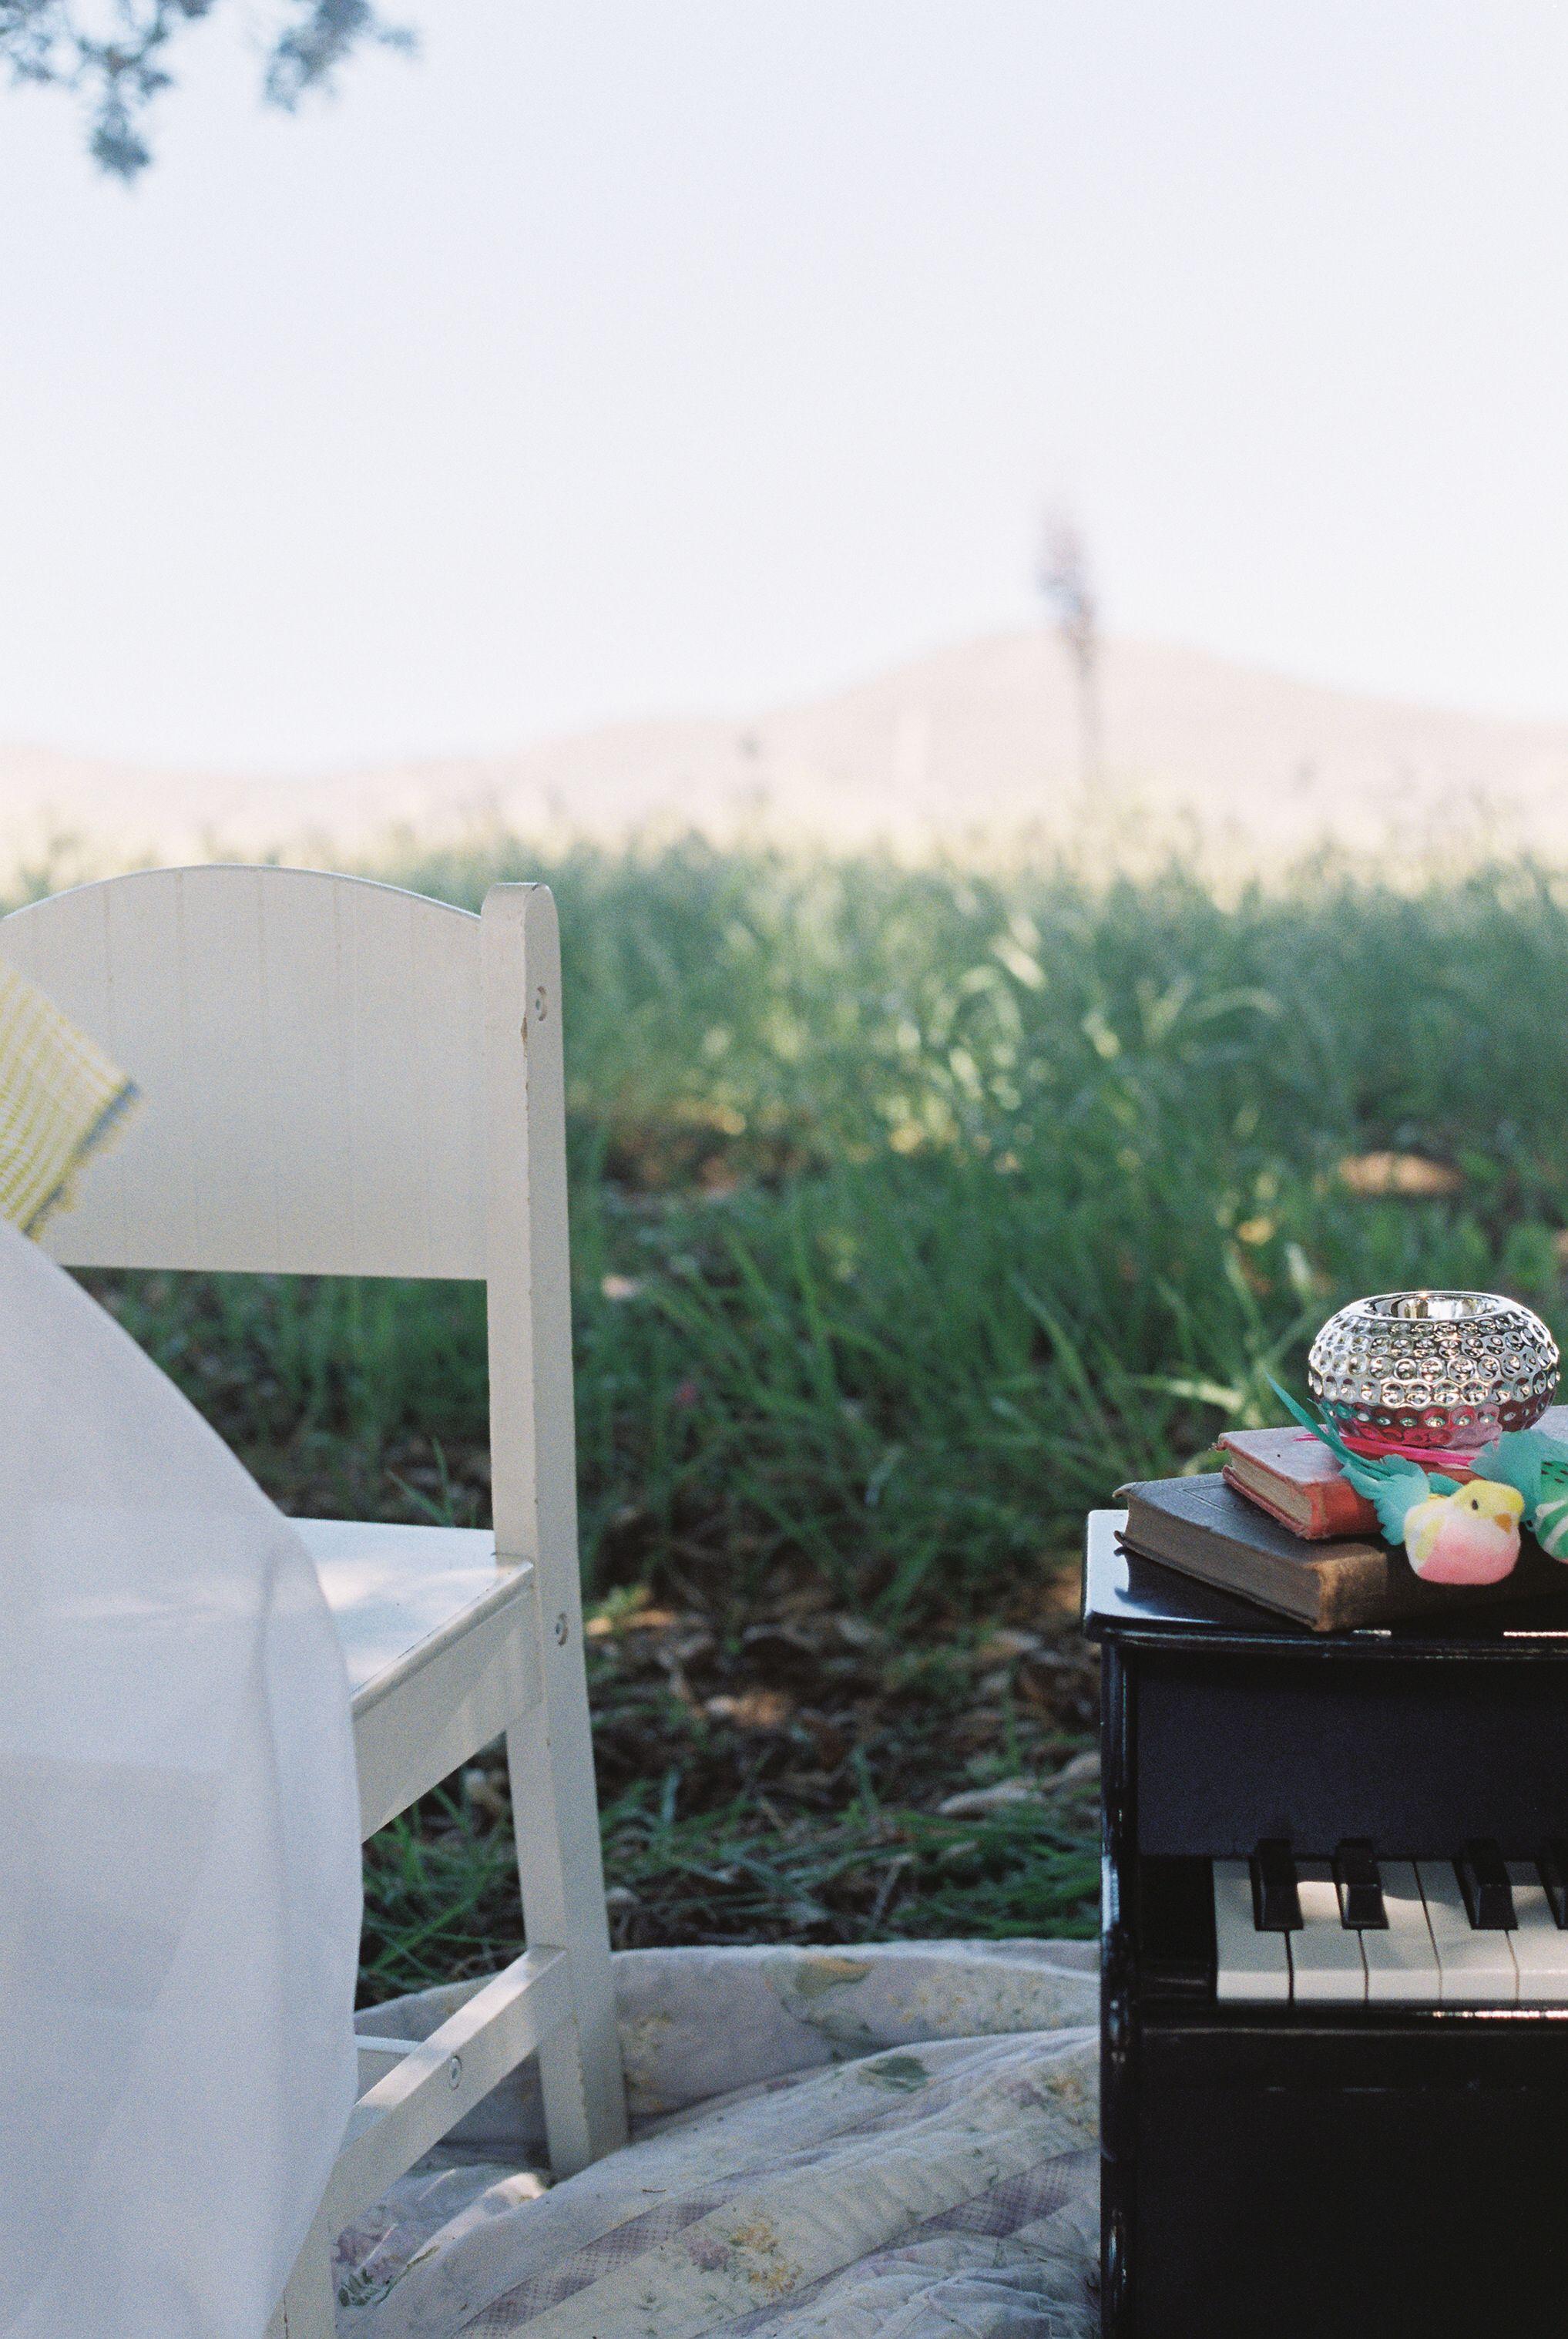 DIY Children's Easter Tea Photoshoot - Canon Ftb QT (50mm lens) 35mm Film Photography Fuji 400H